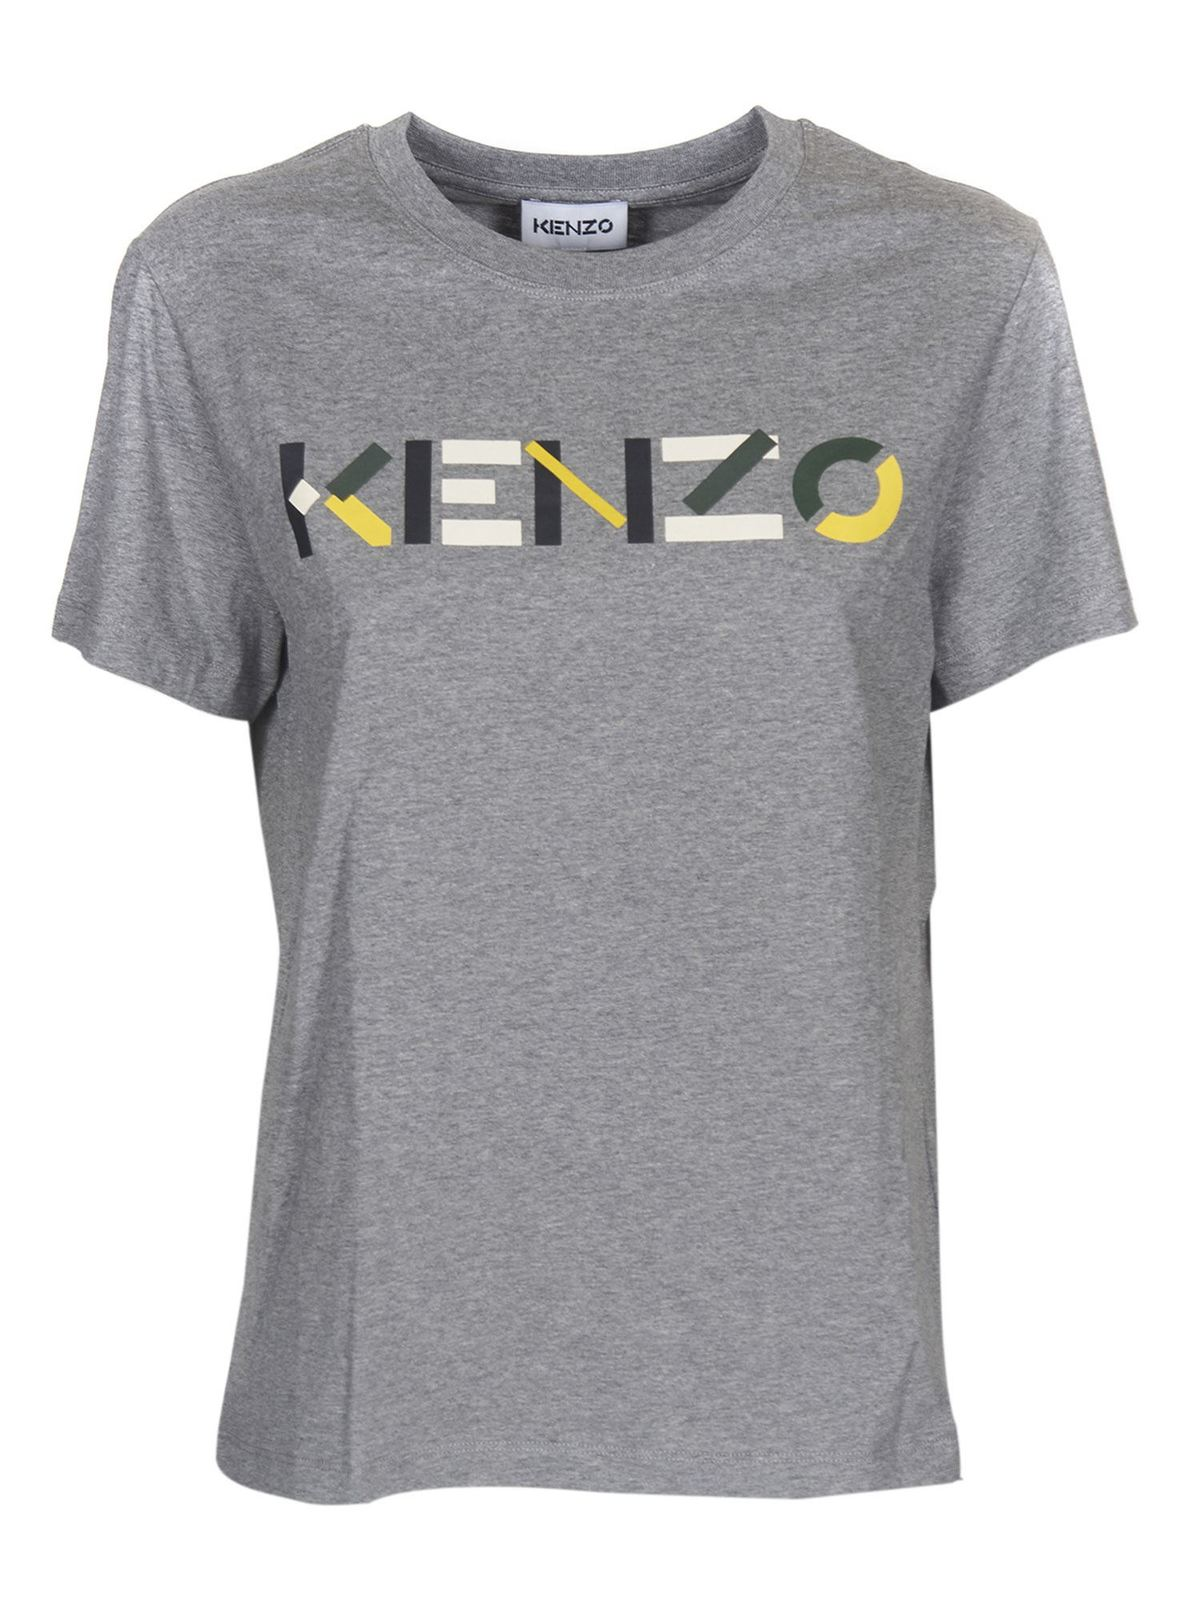 KENZO MULTICOLOR LOGO T-SHIRT IN GRAY